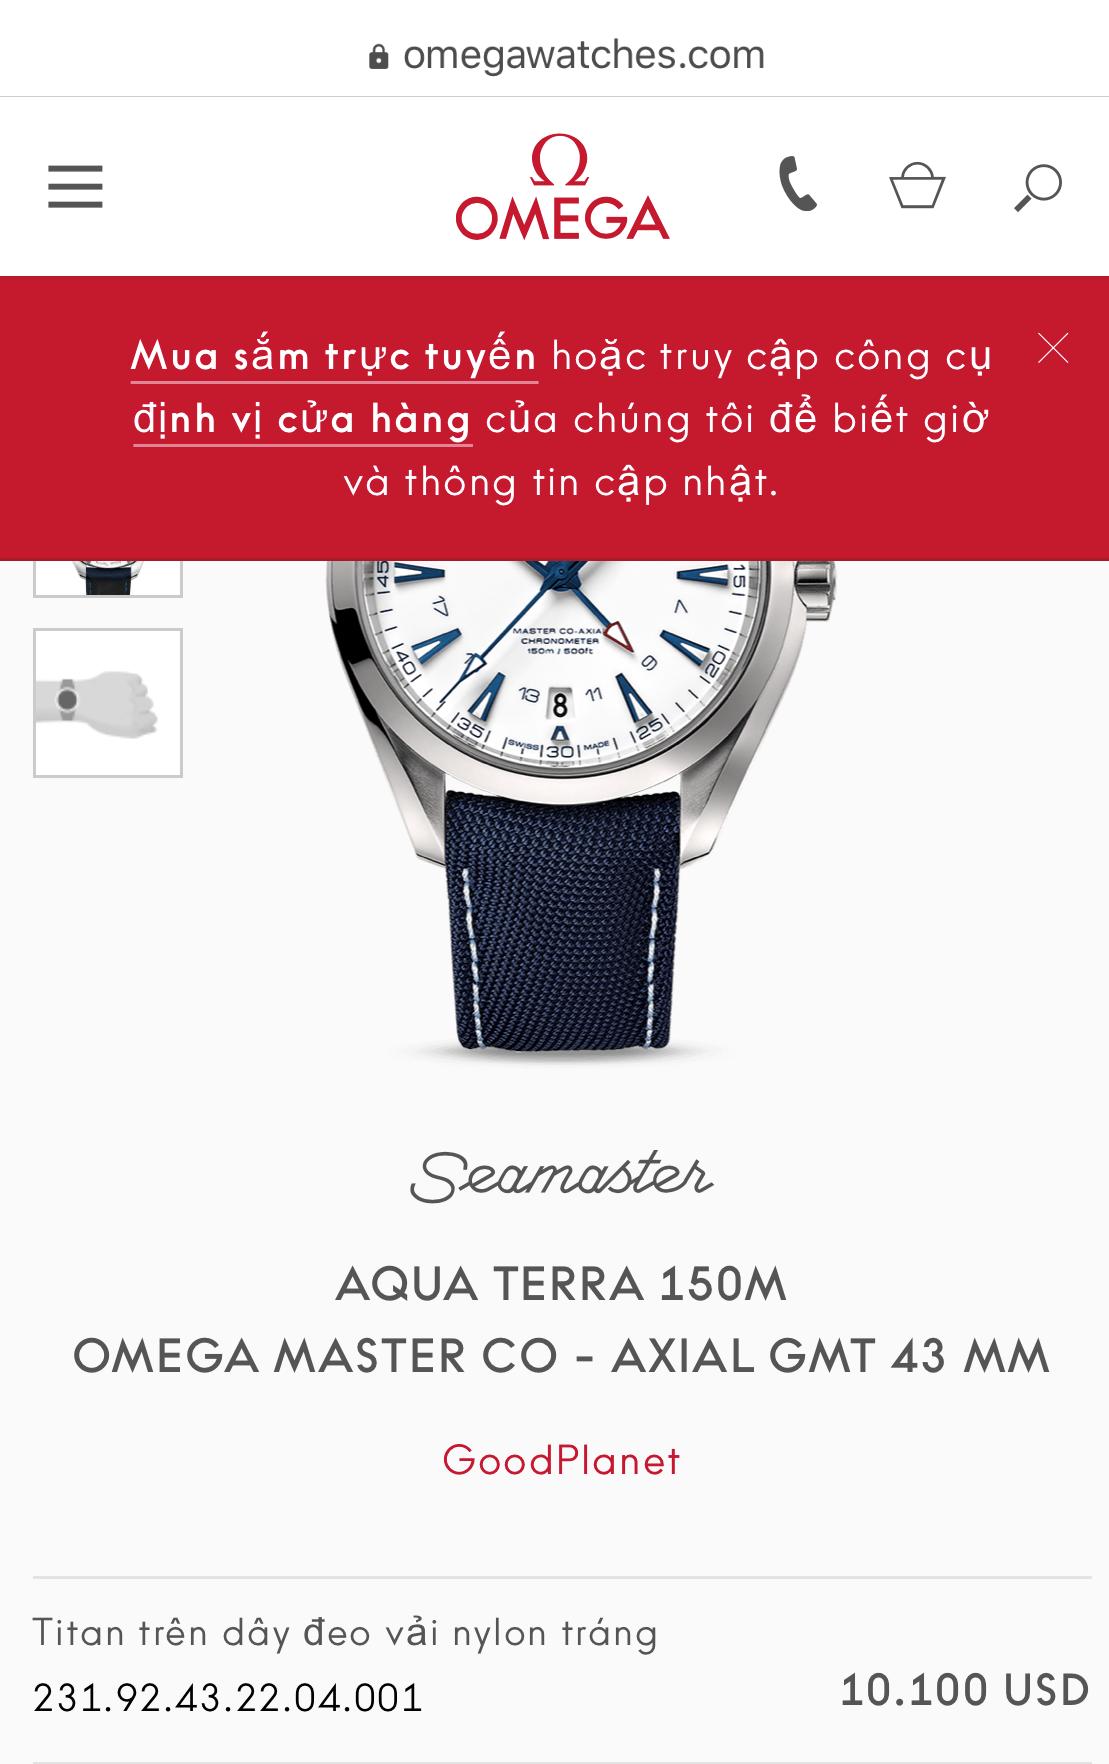 Omega Seamaster Aqua Terra 150M GoodPlanet GMT